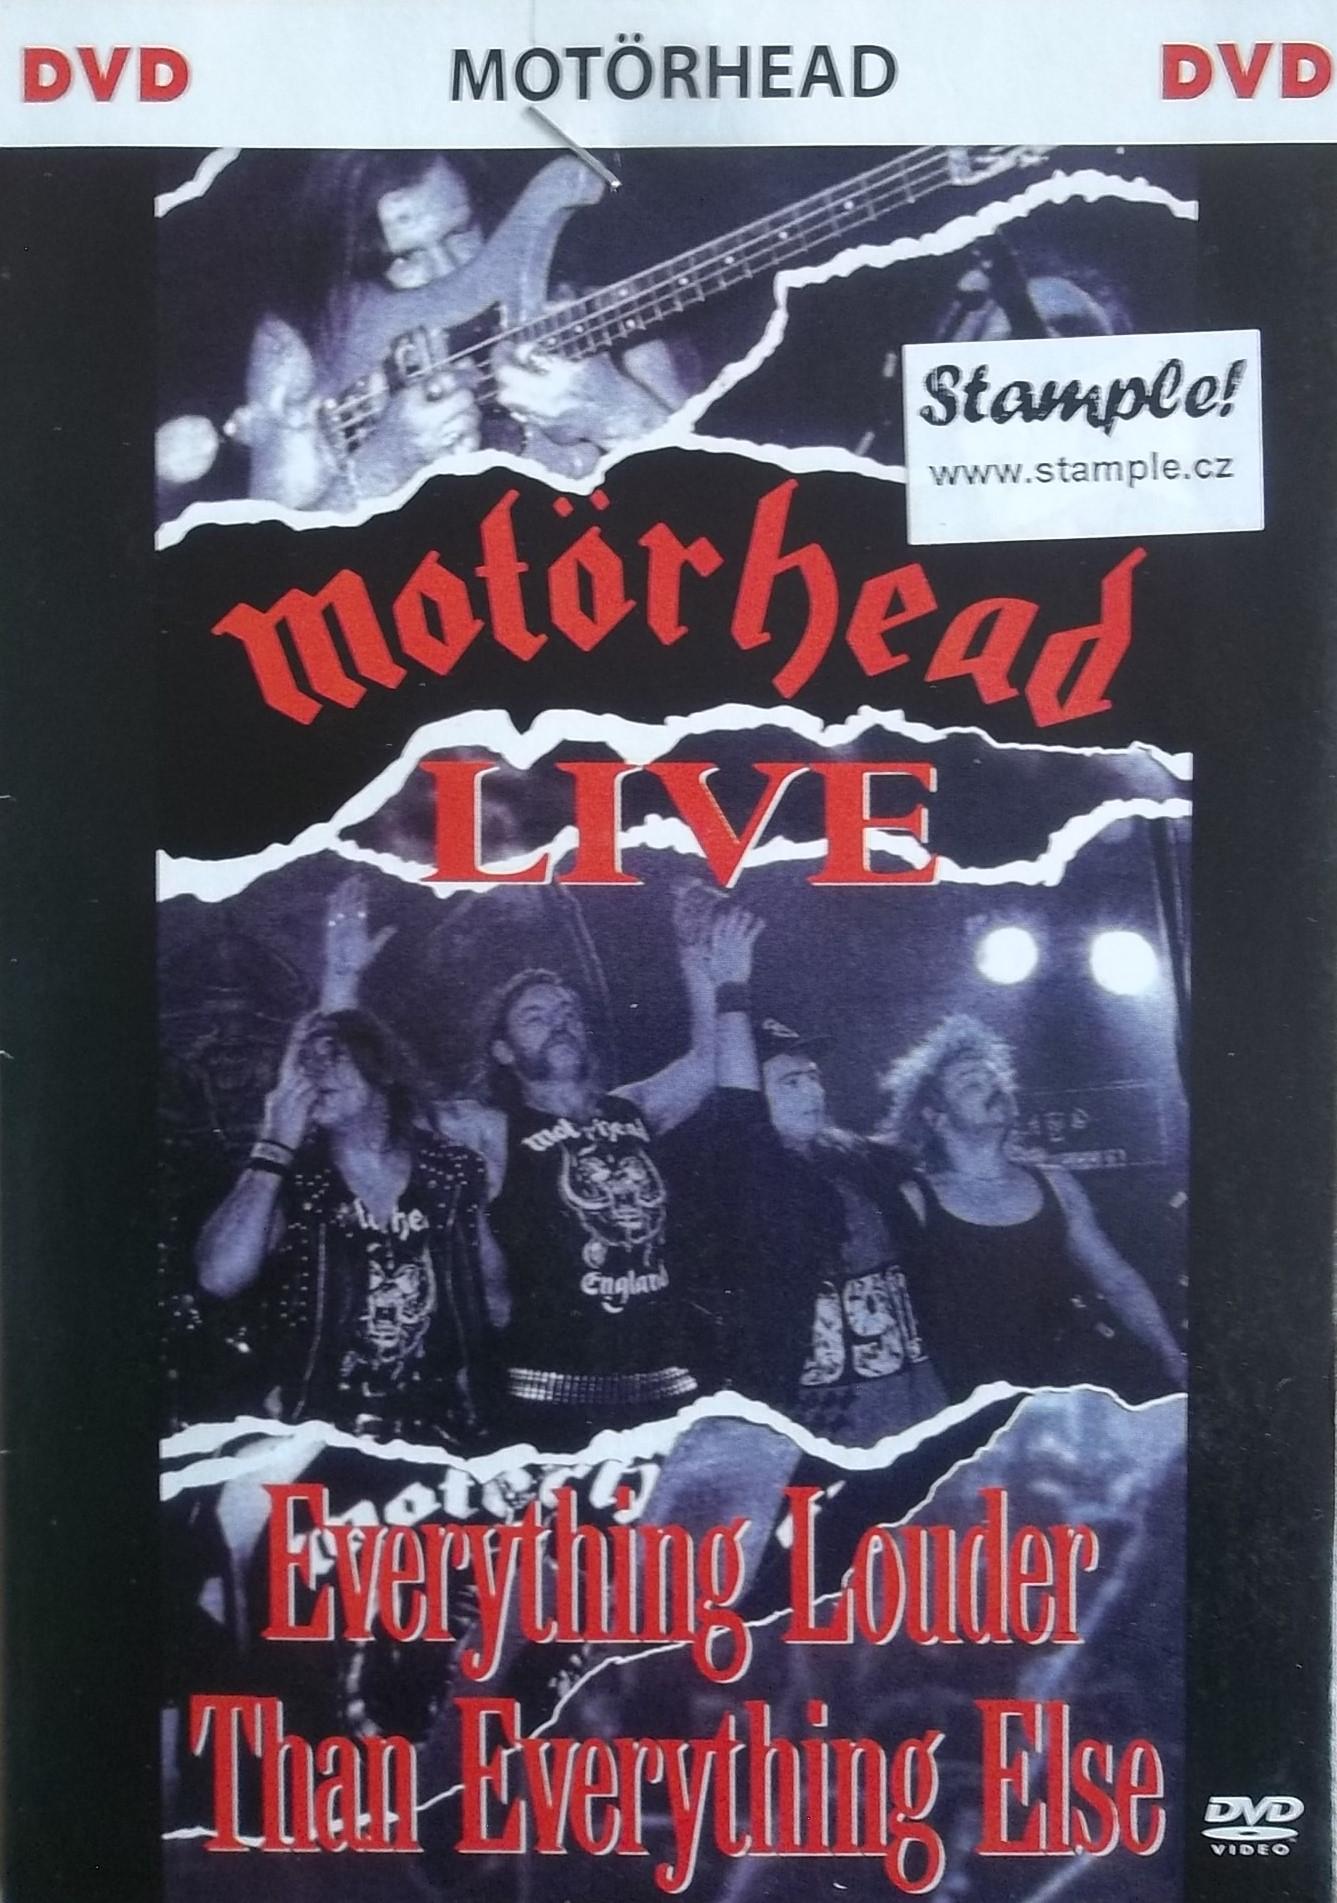 Motörhead - Live DVD